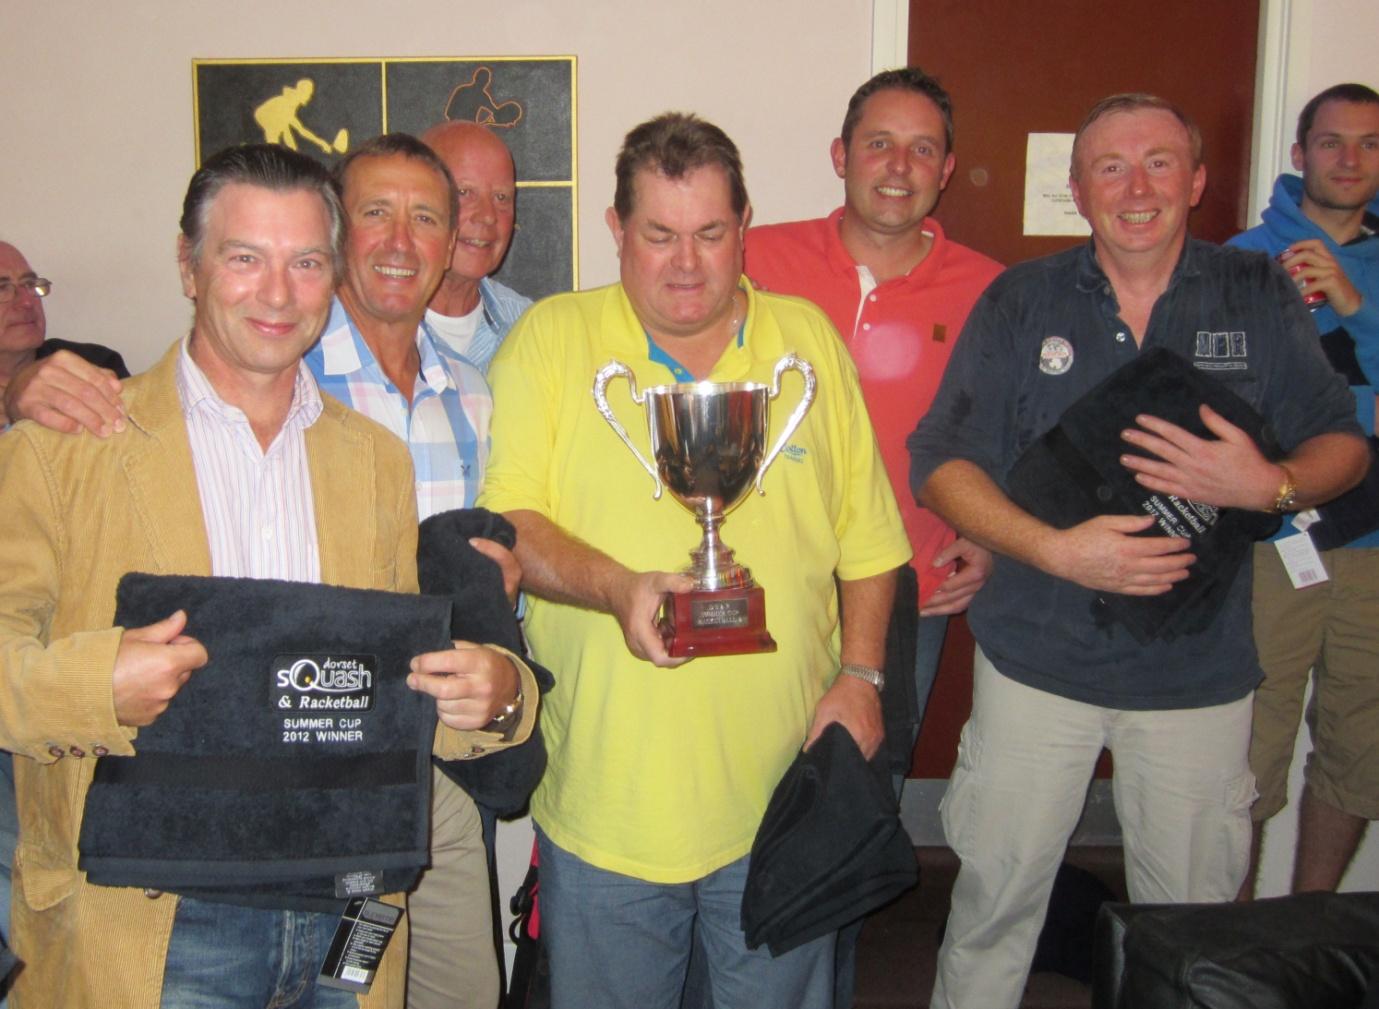 Racketball winners